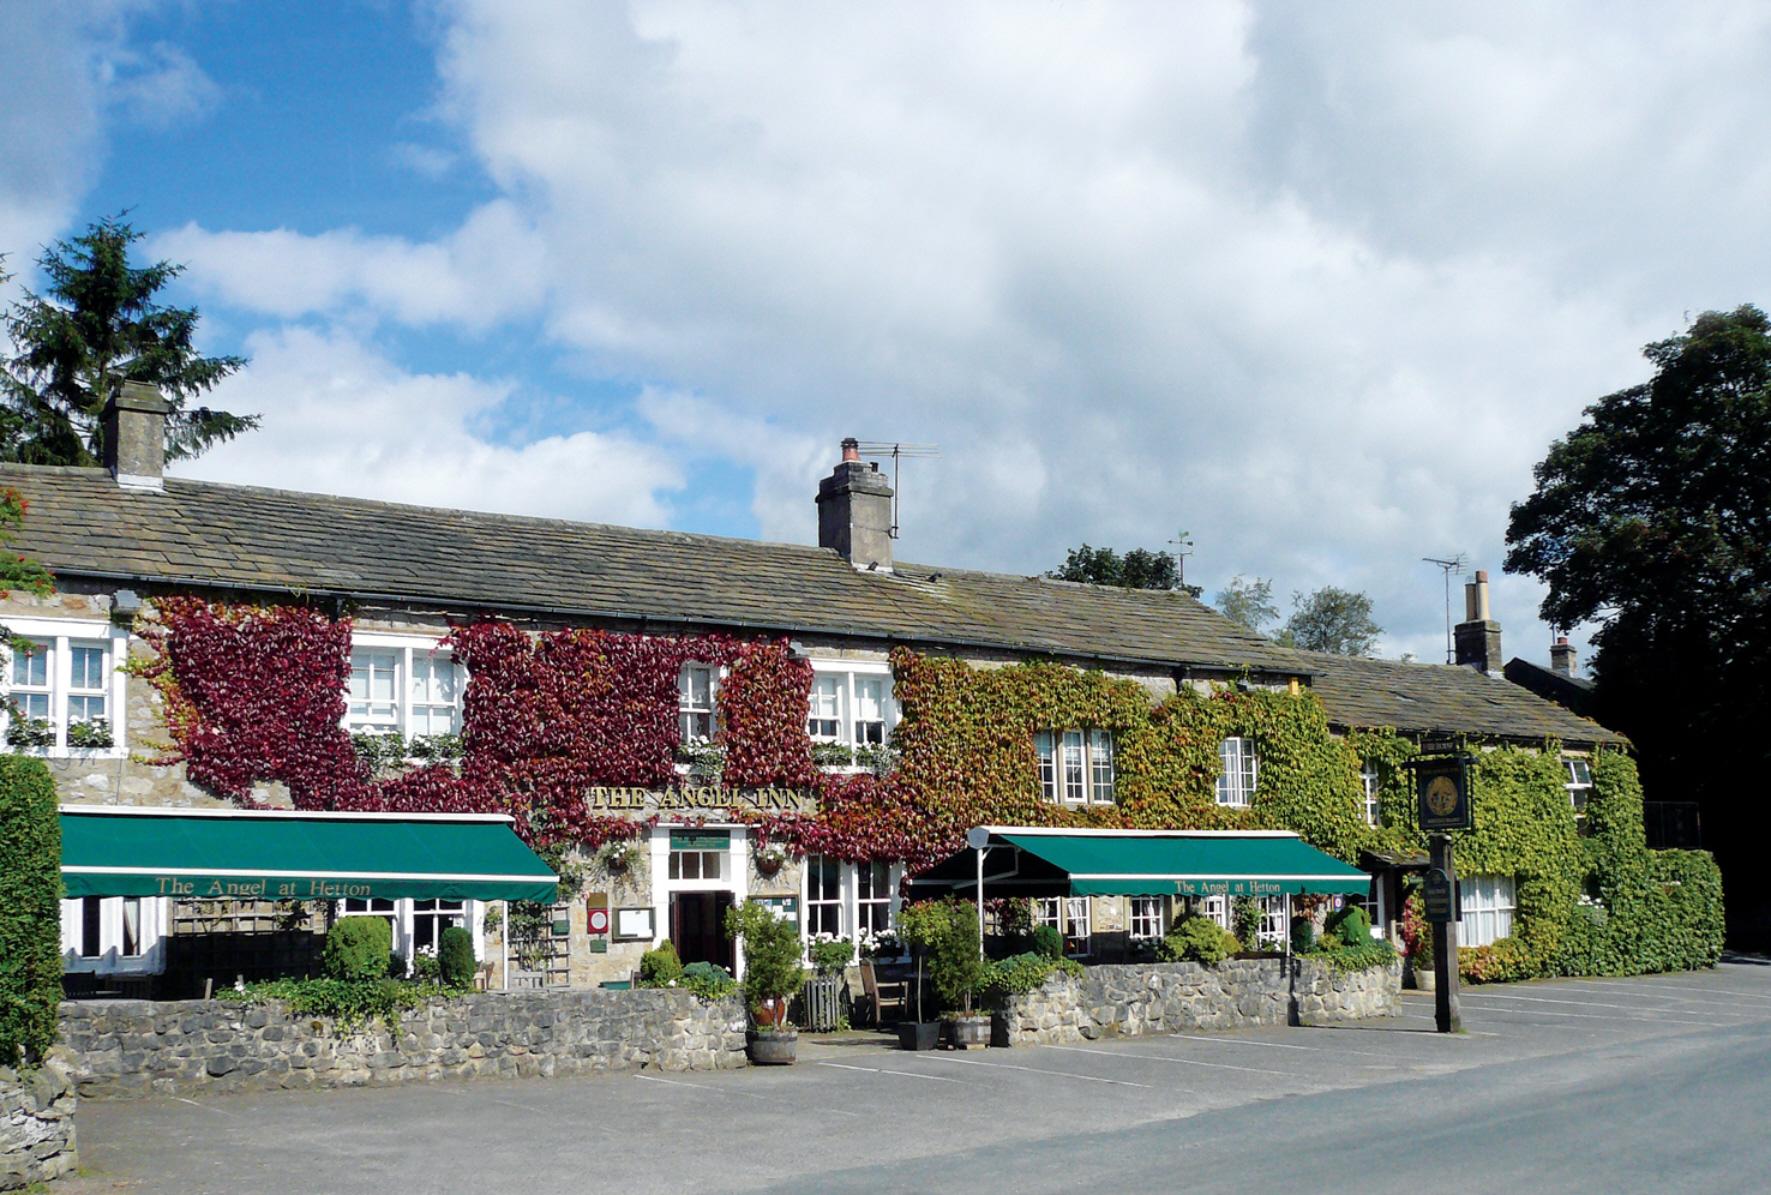 The Angel Inn exterior